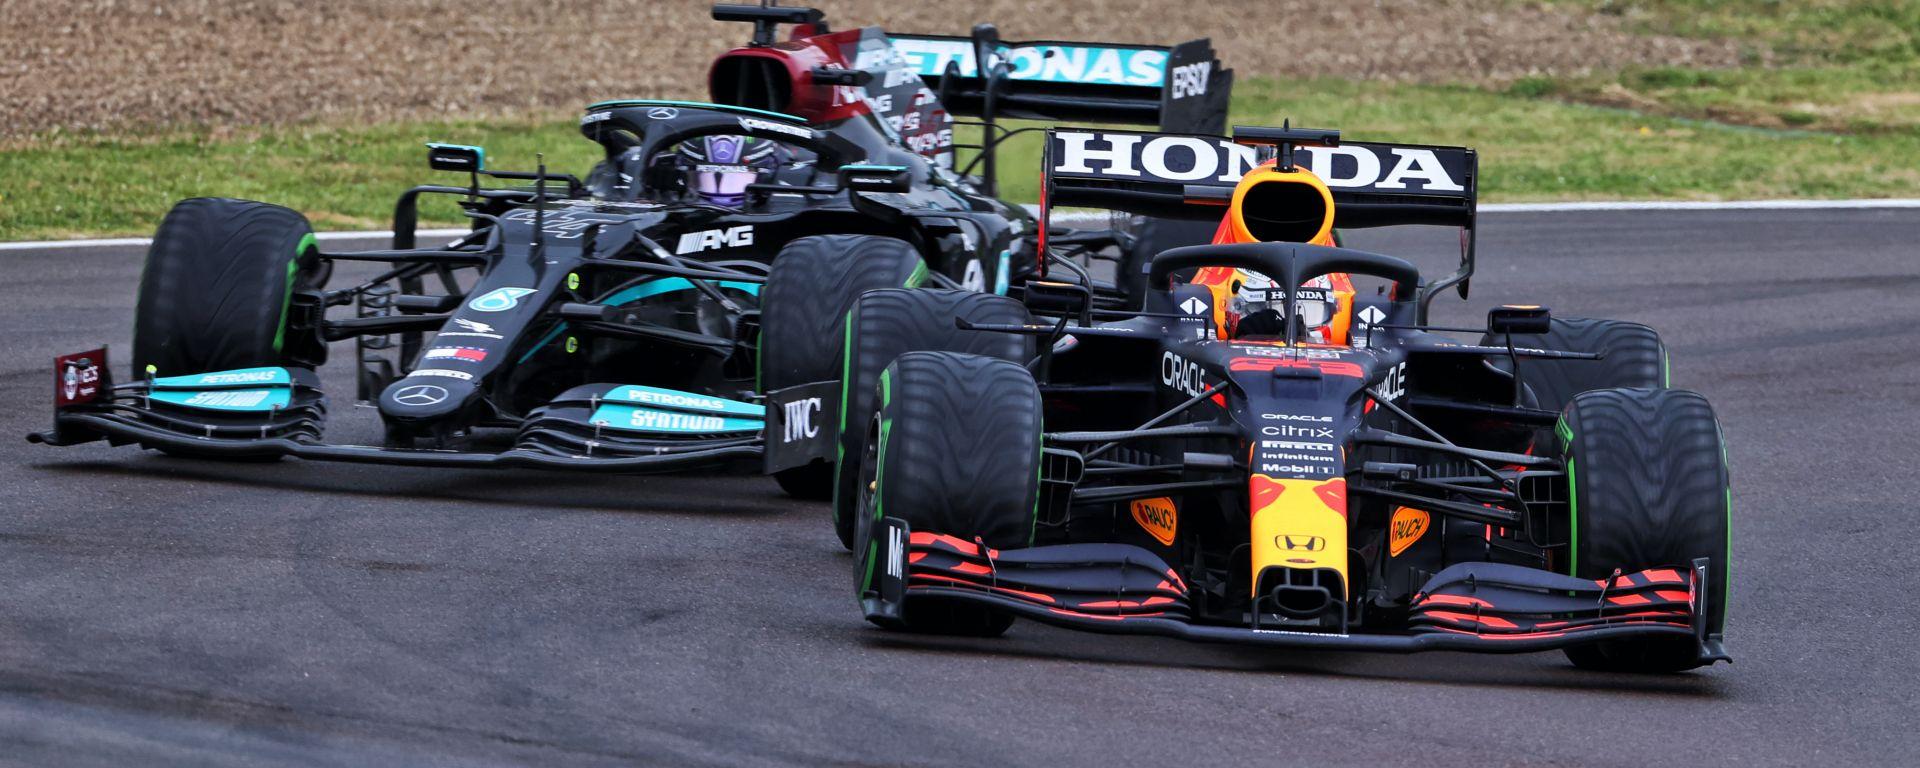 F1 GP Emilia Romagna 2021, Imola: Max Verstappen (Red Bull) in lotta con Lewis Hamilton (Mercedes)